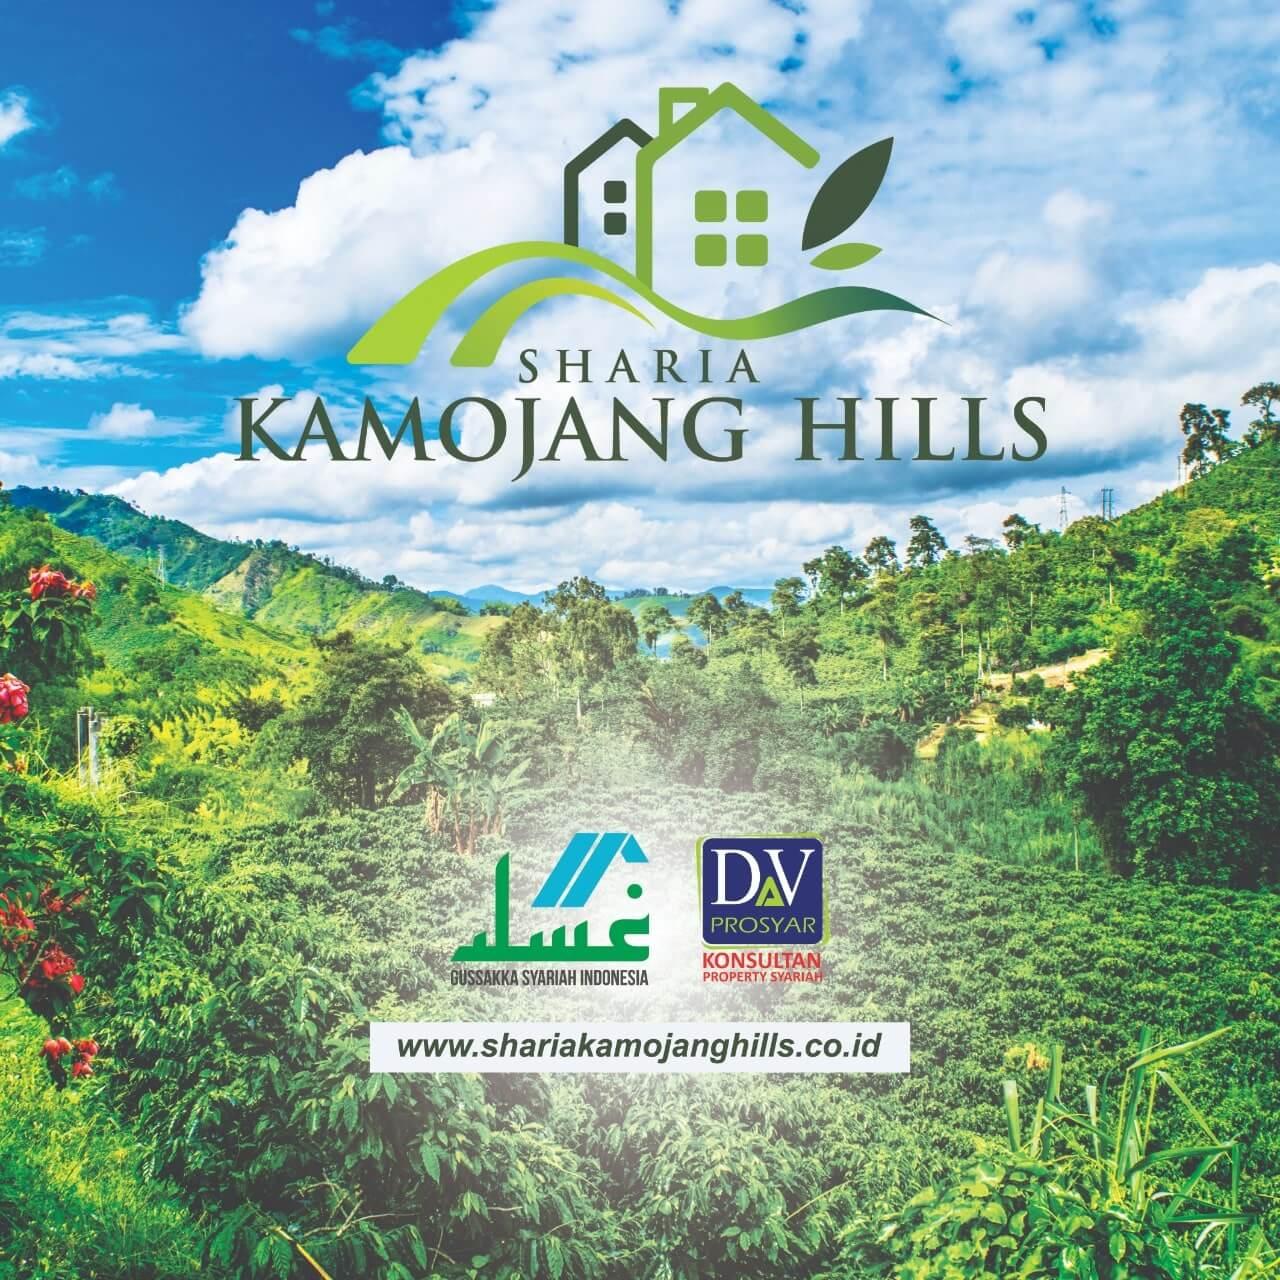 kavling dan villa syariah di garut - teaser kamojang hills - shariakamojanghills.co.id